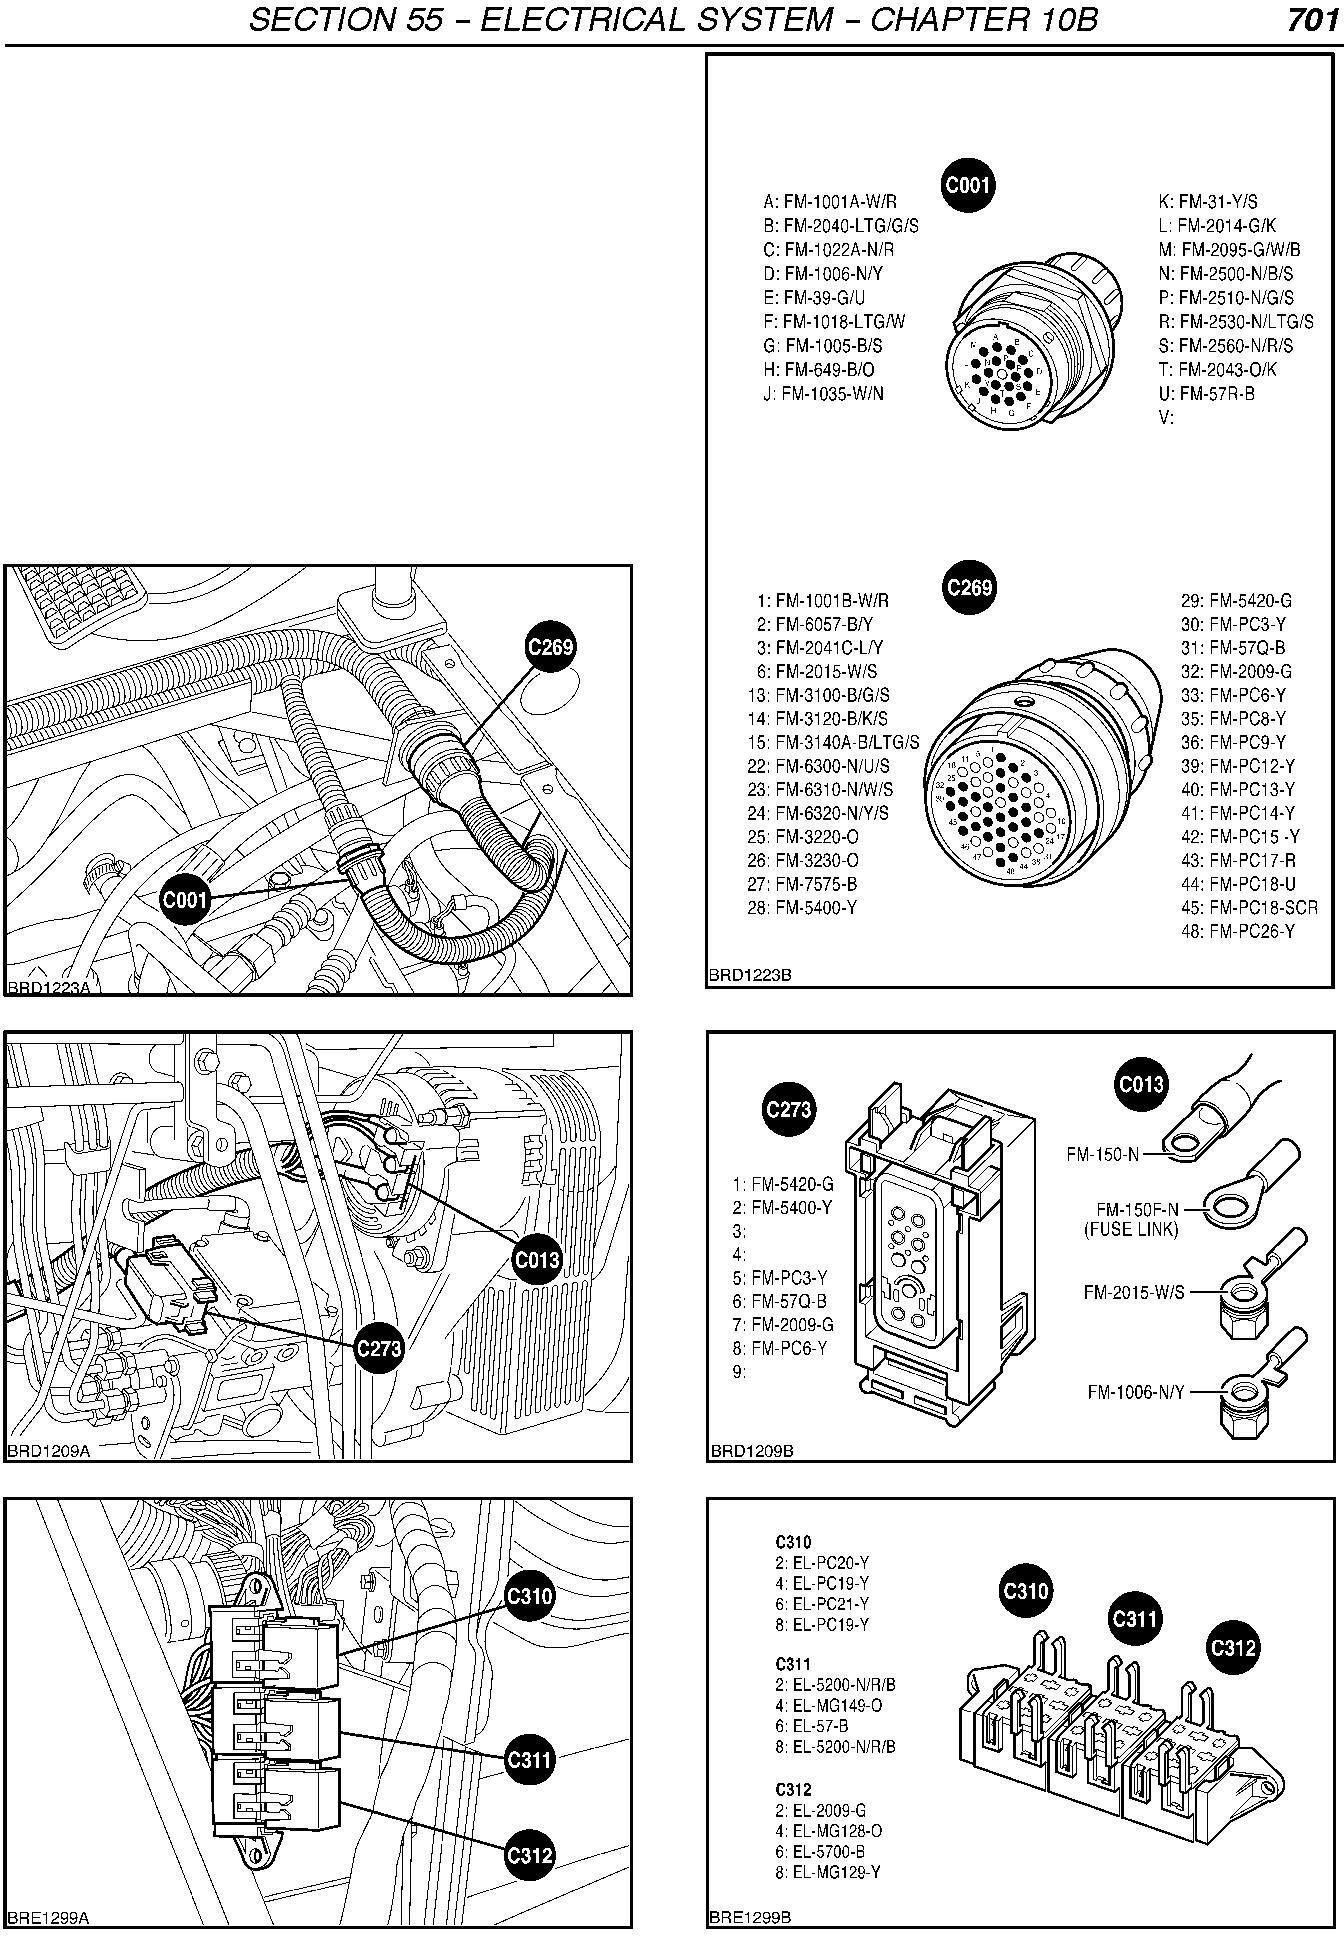 New Holland TM120/125/130/140/150/155, TM175-TM190 Tractor Fault Codes Diagnostic Service Manual - 2